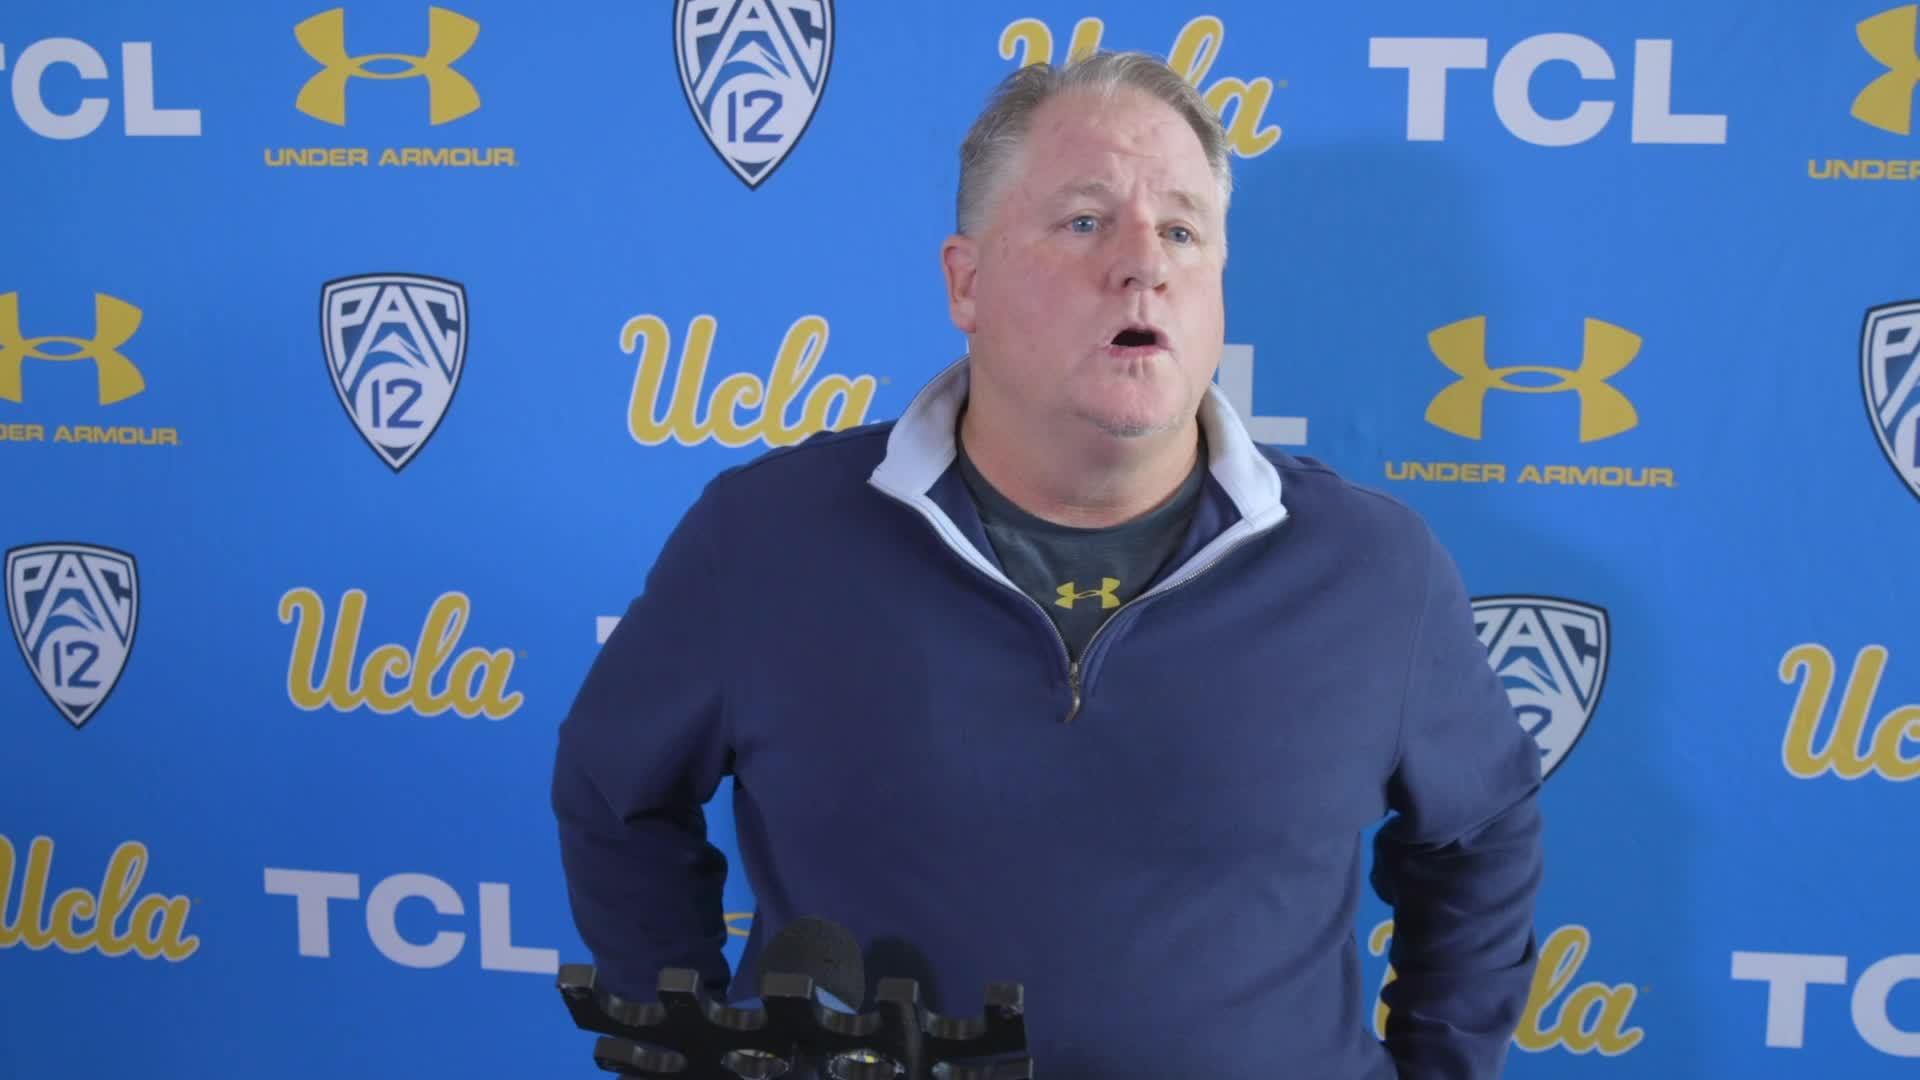 UCLA Football National Signing Day Media Availability - Chip Kelly - 12.19.18